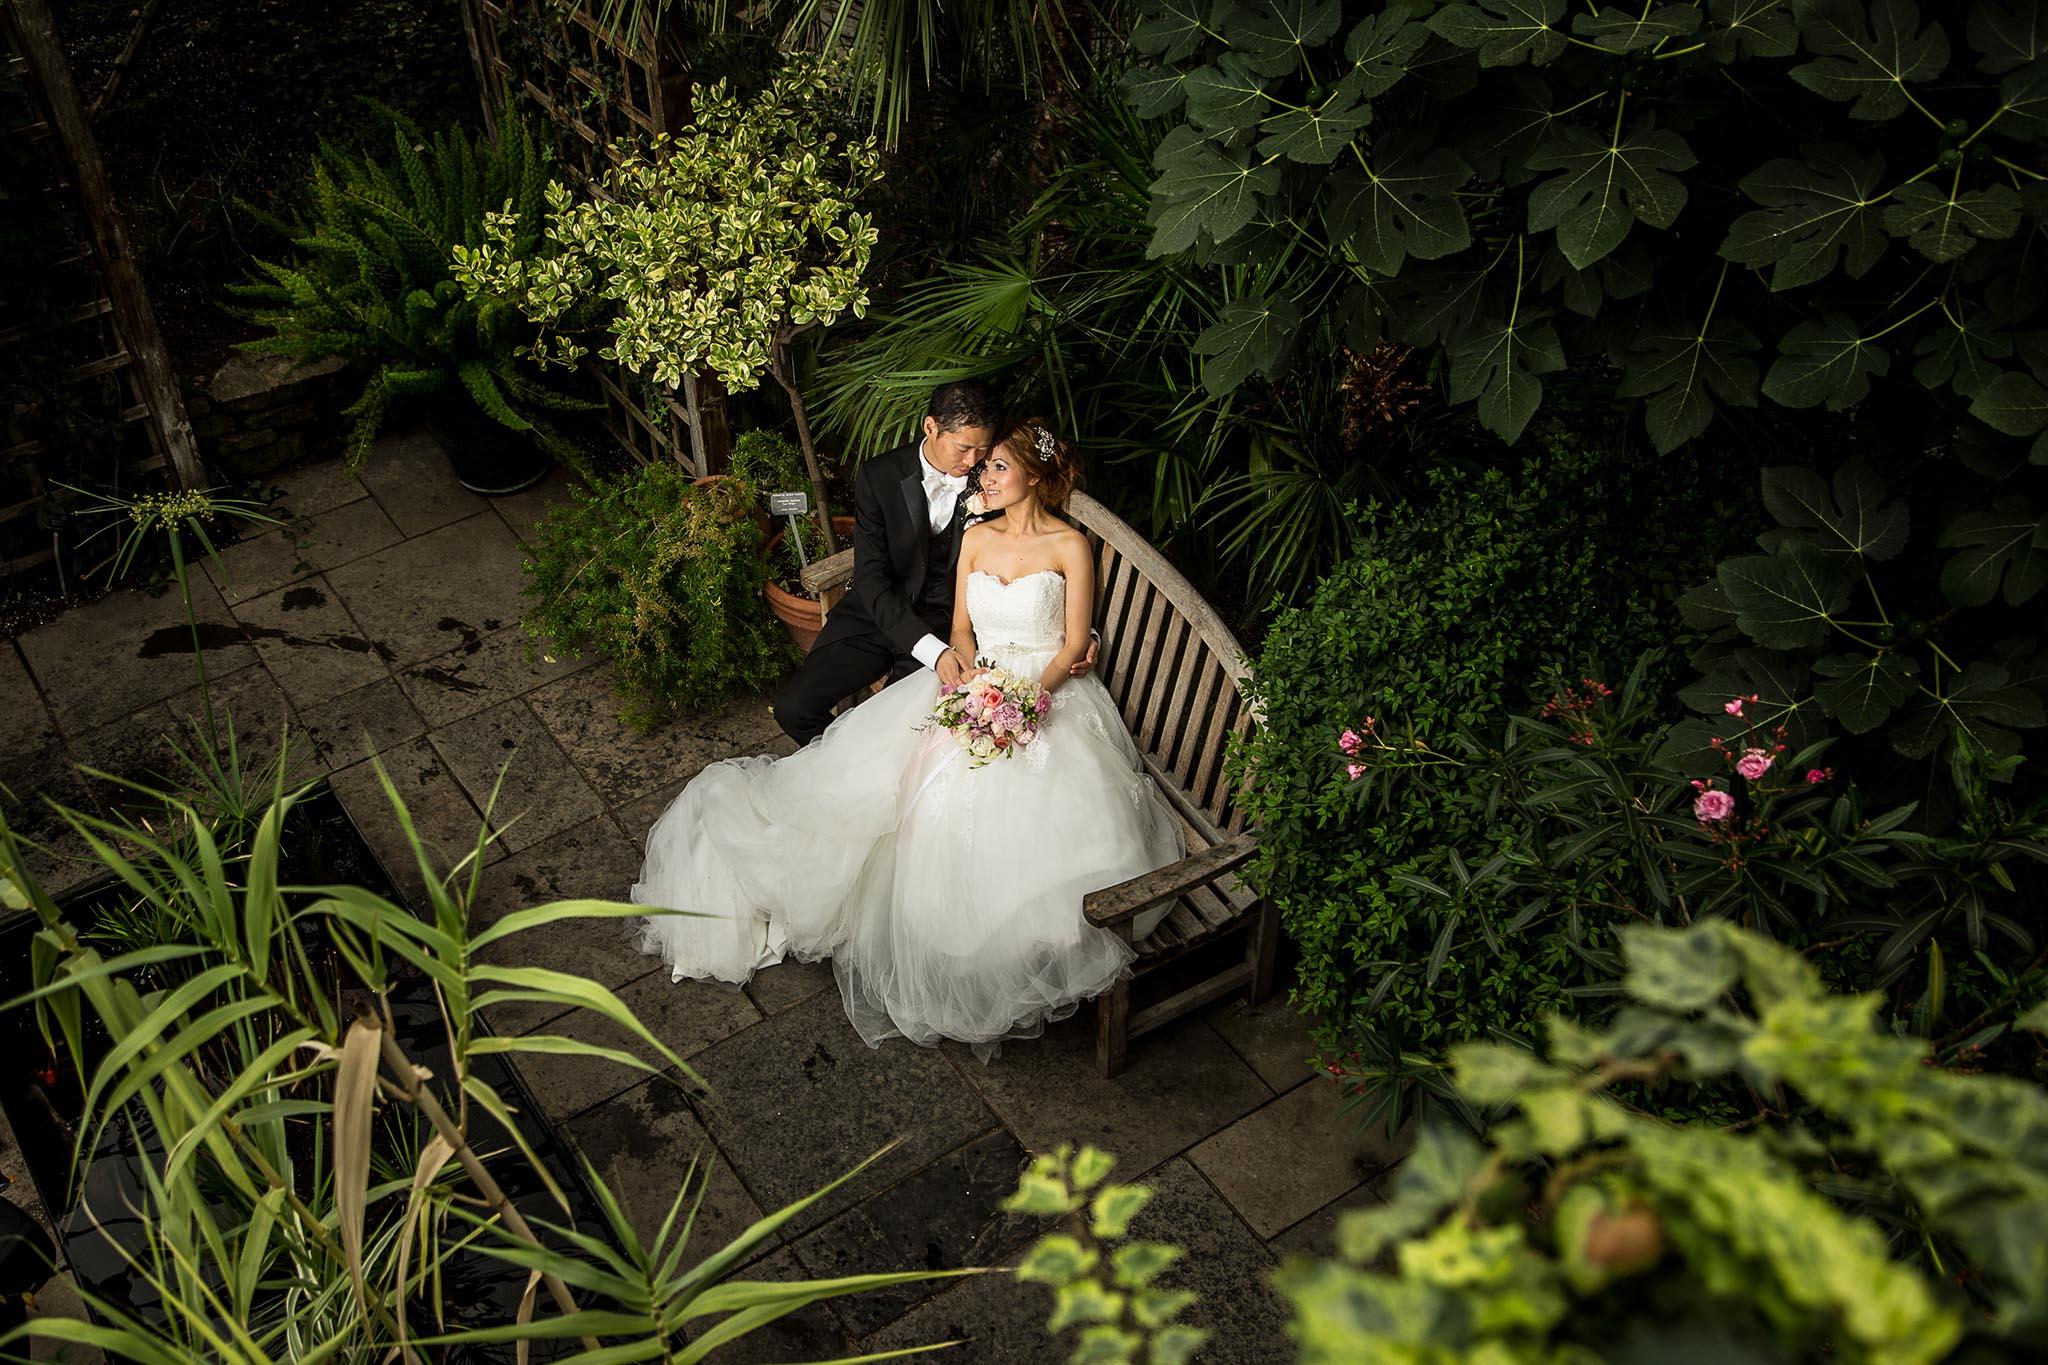 royal botanical garden wedding photography